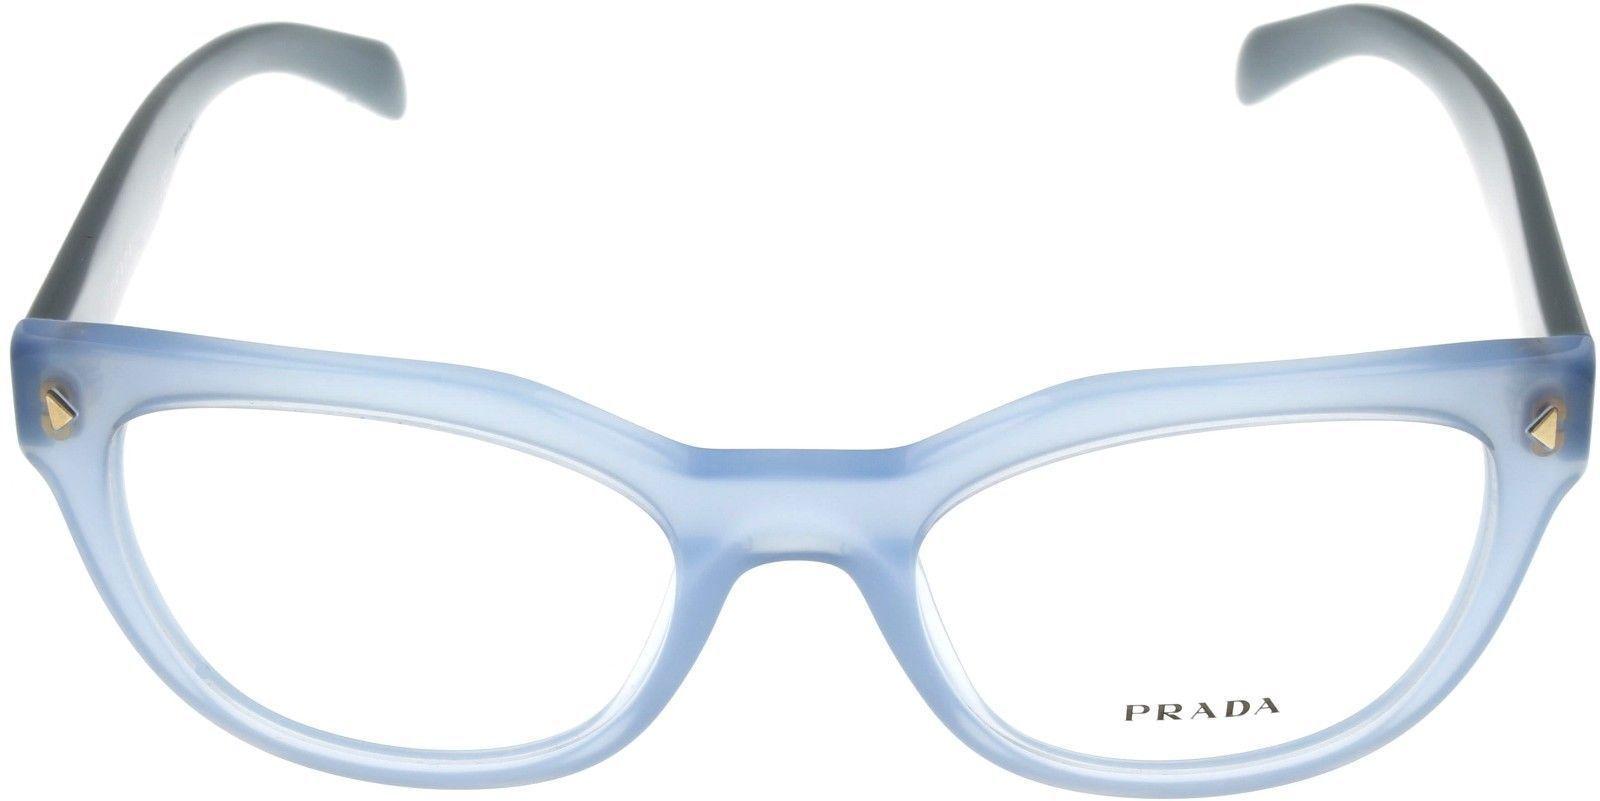 Prada Eyewear Frame Blue Azure Cat Eye Women PR21SV UEX101